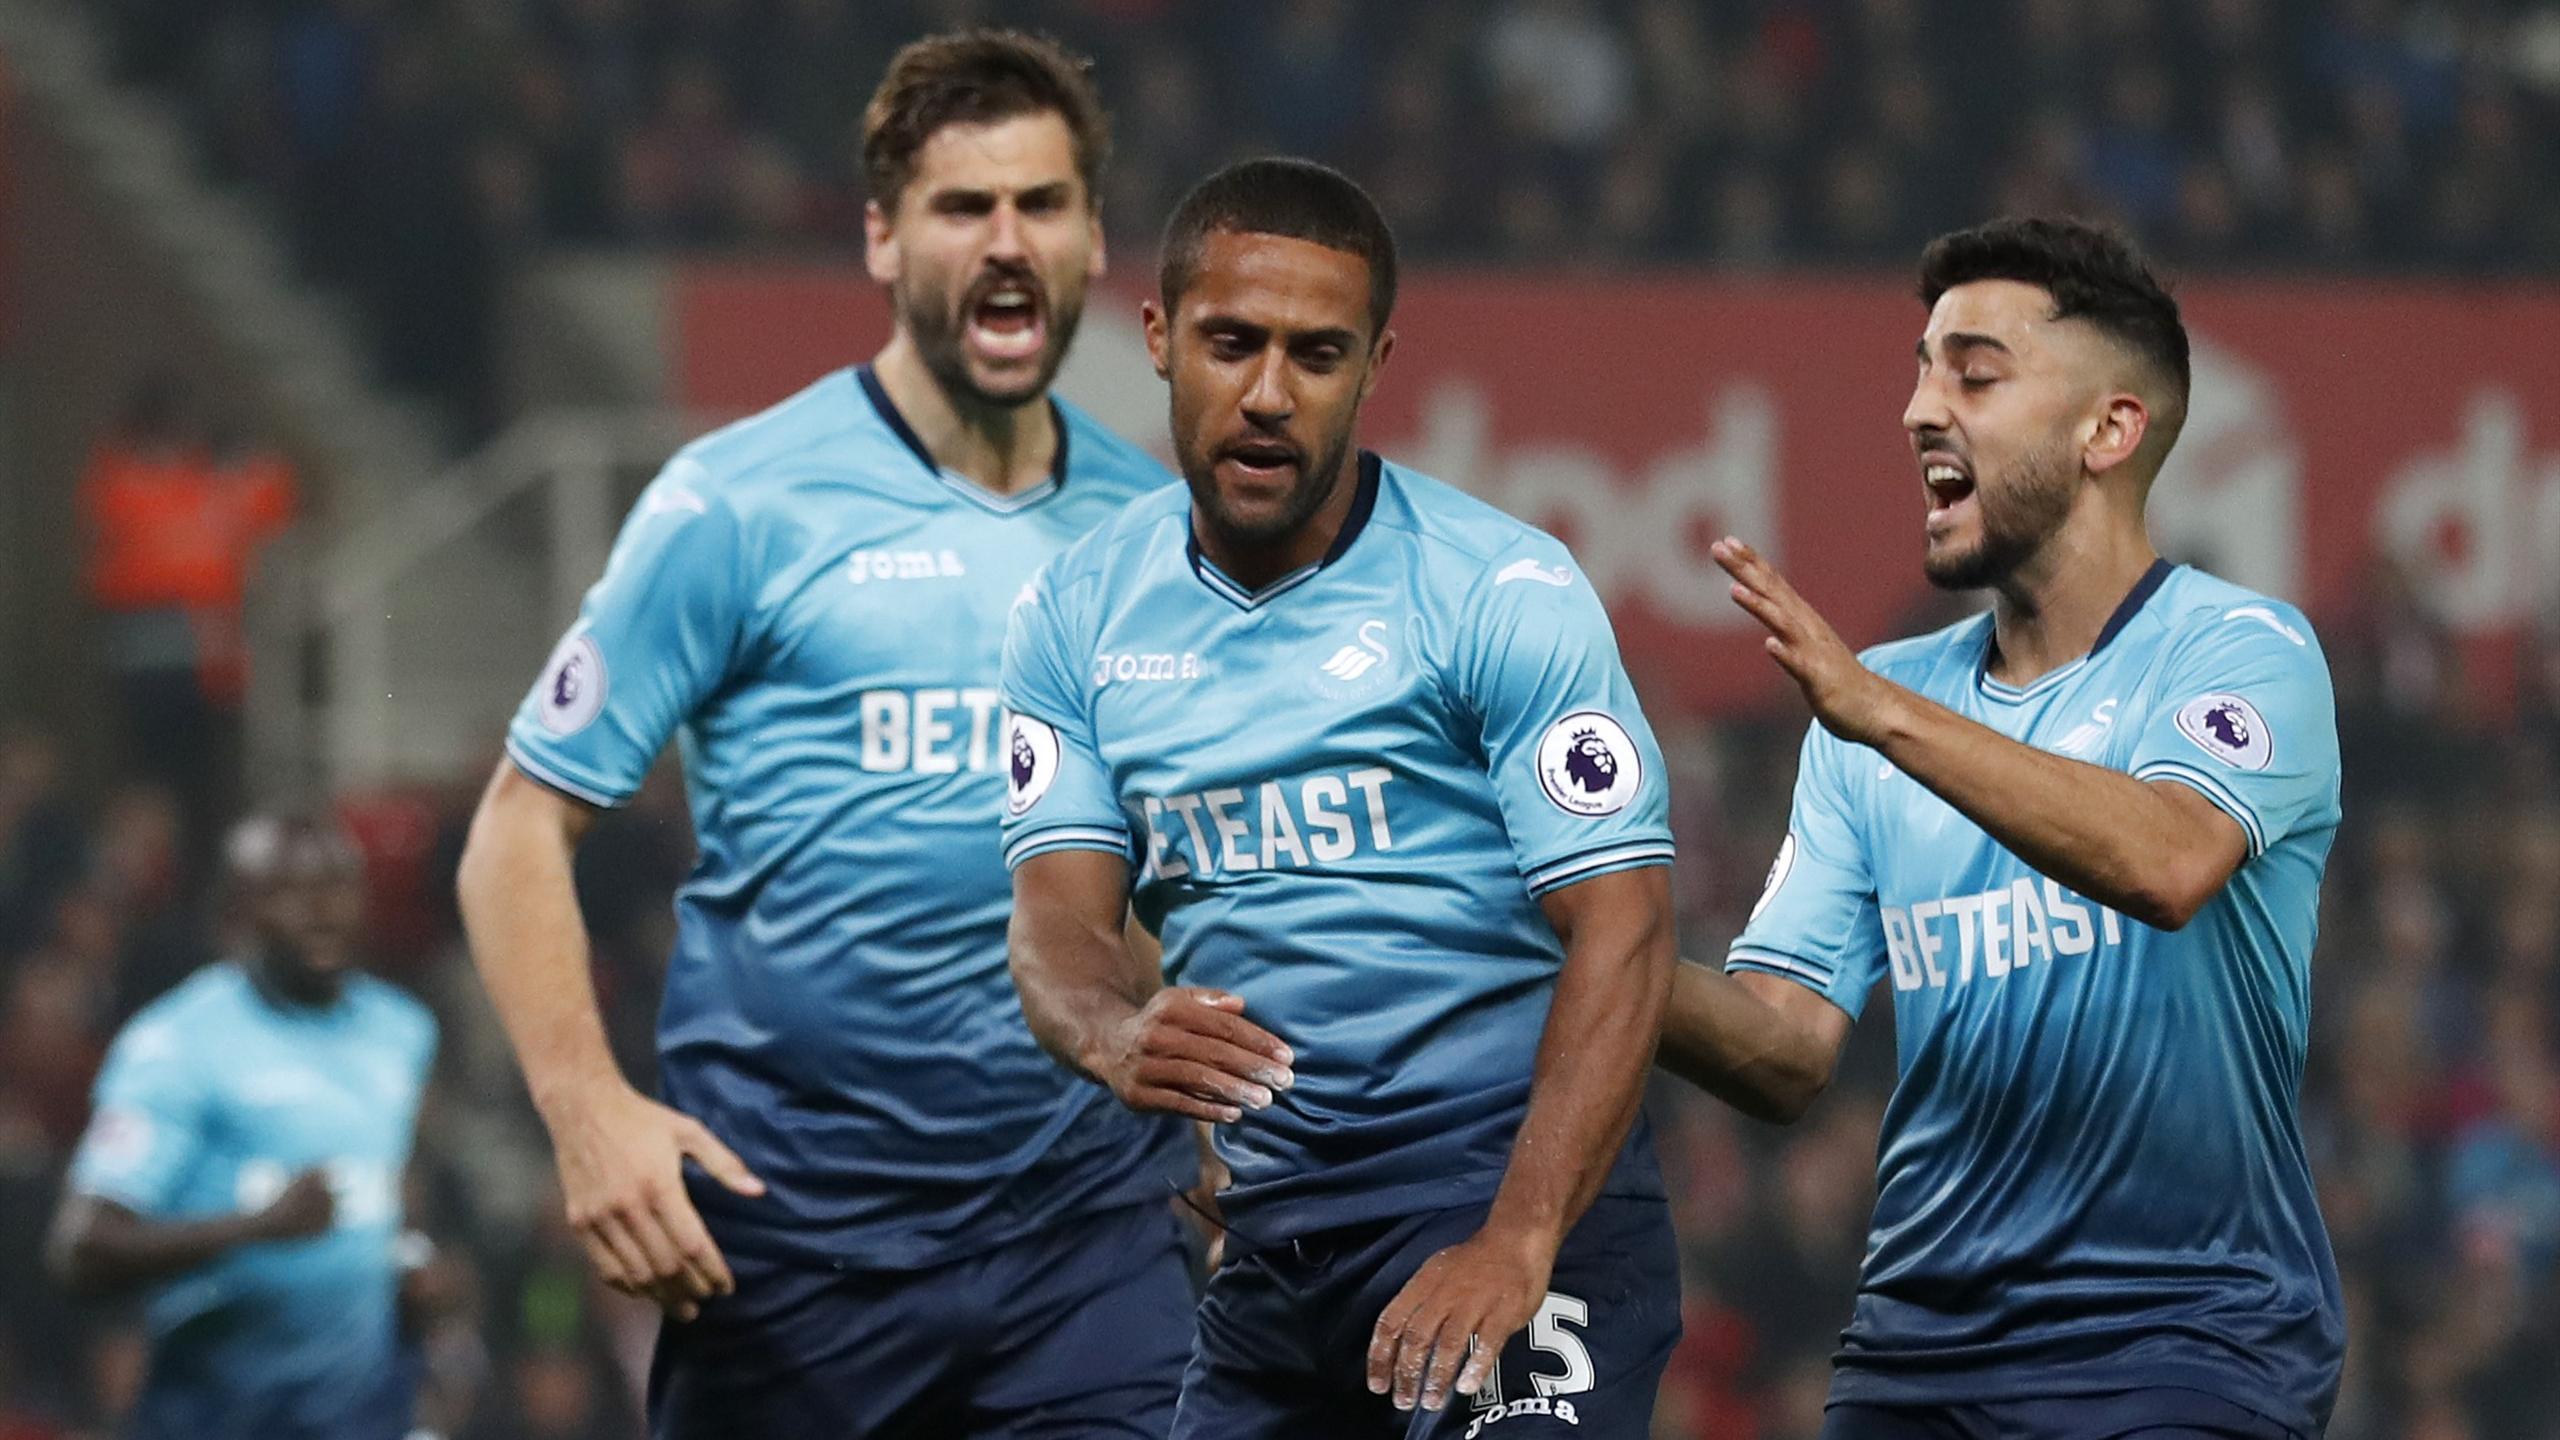 Swansea City's Wayne Routledge celebrates scoring against Stoke